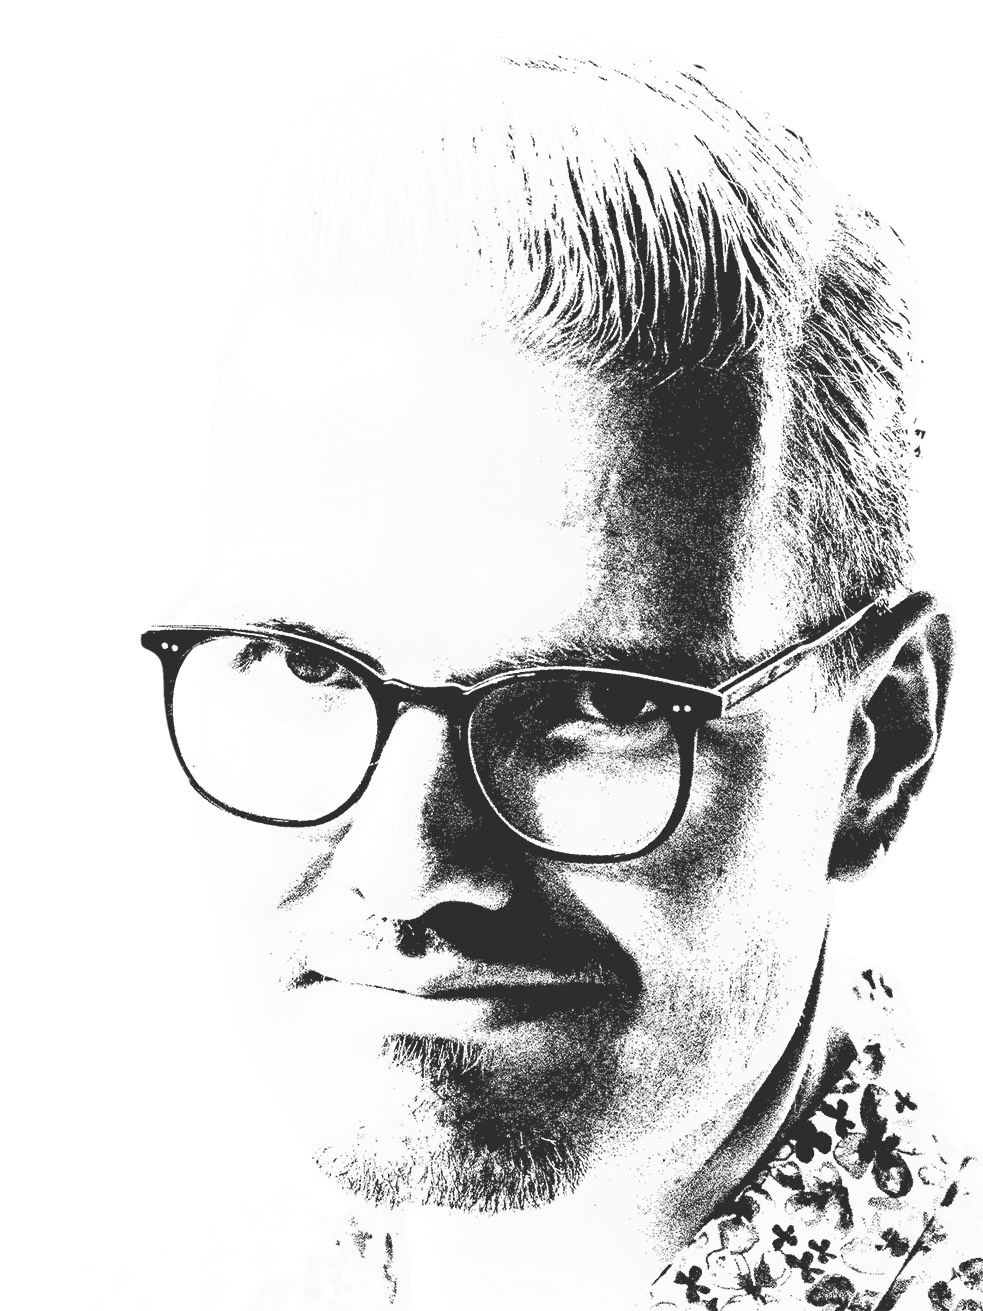 B. (Björn) Hermans